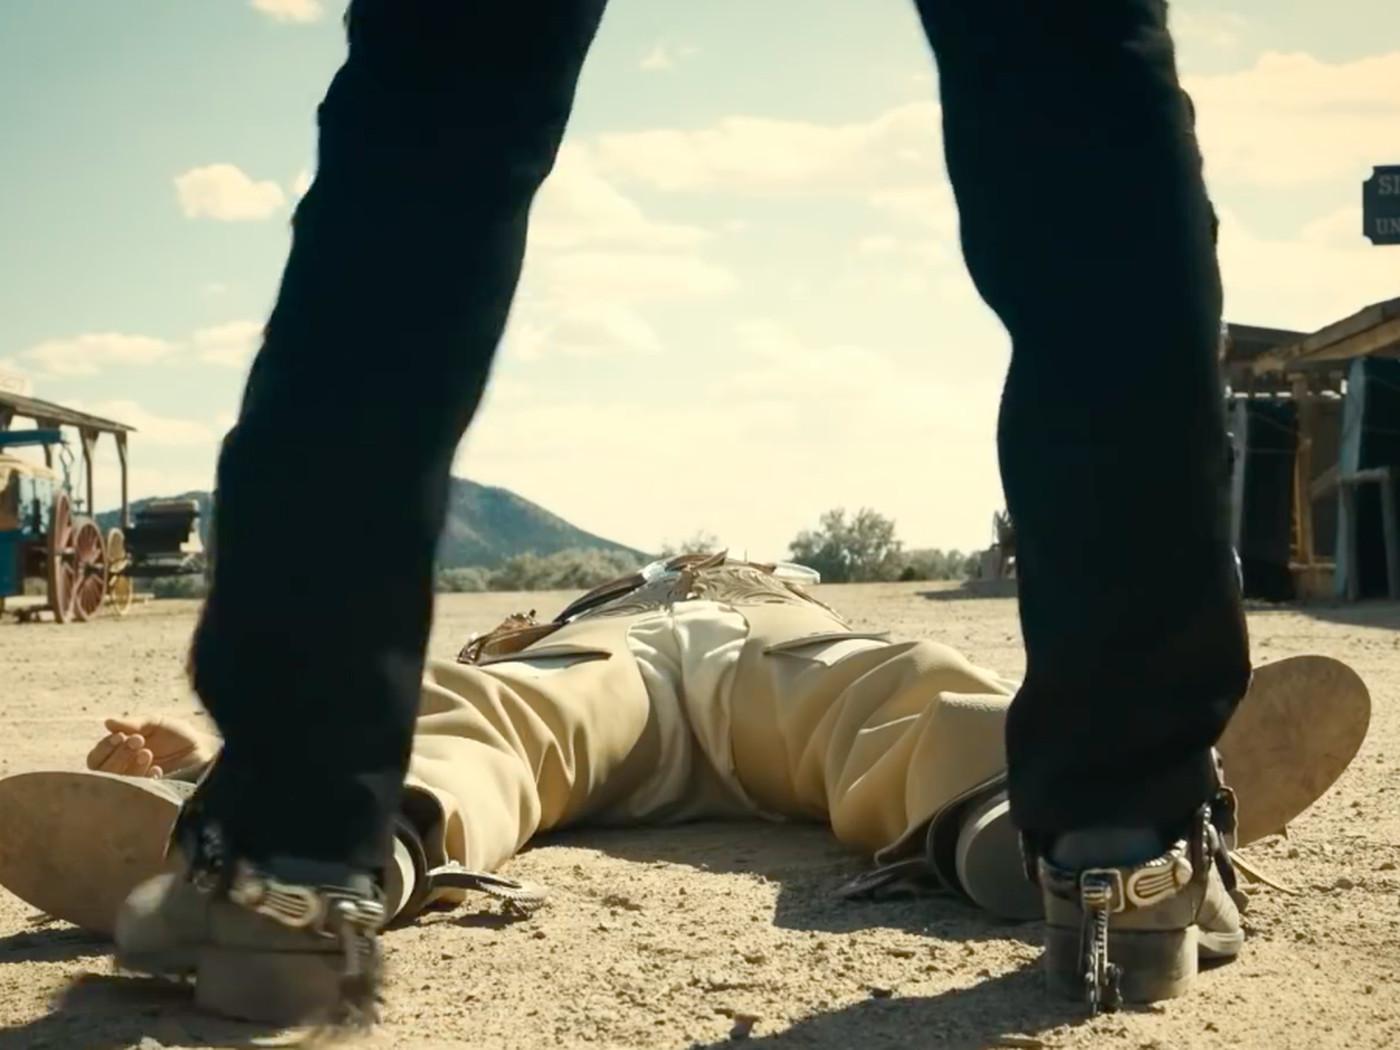 Ballad of Buster Scruggs review: Coen bros' Netflix Western